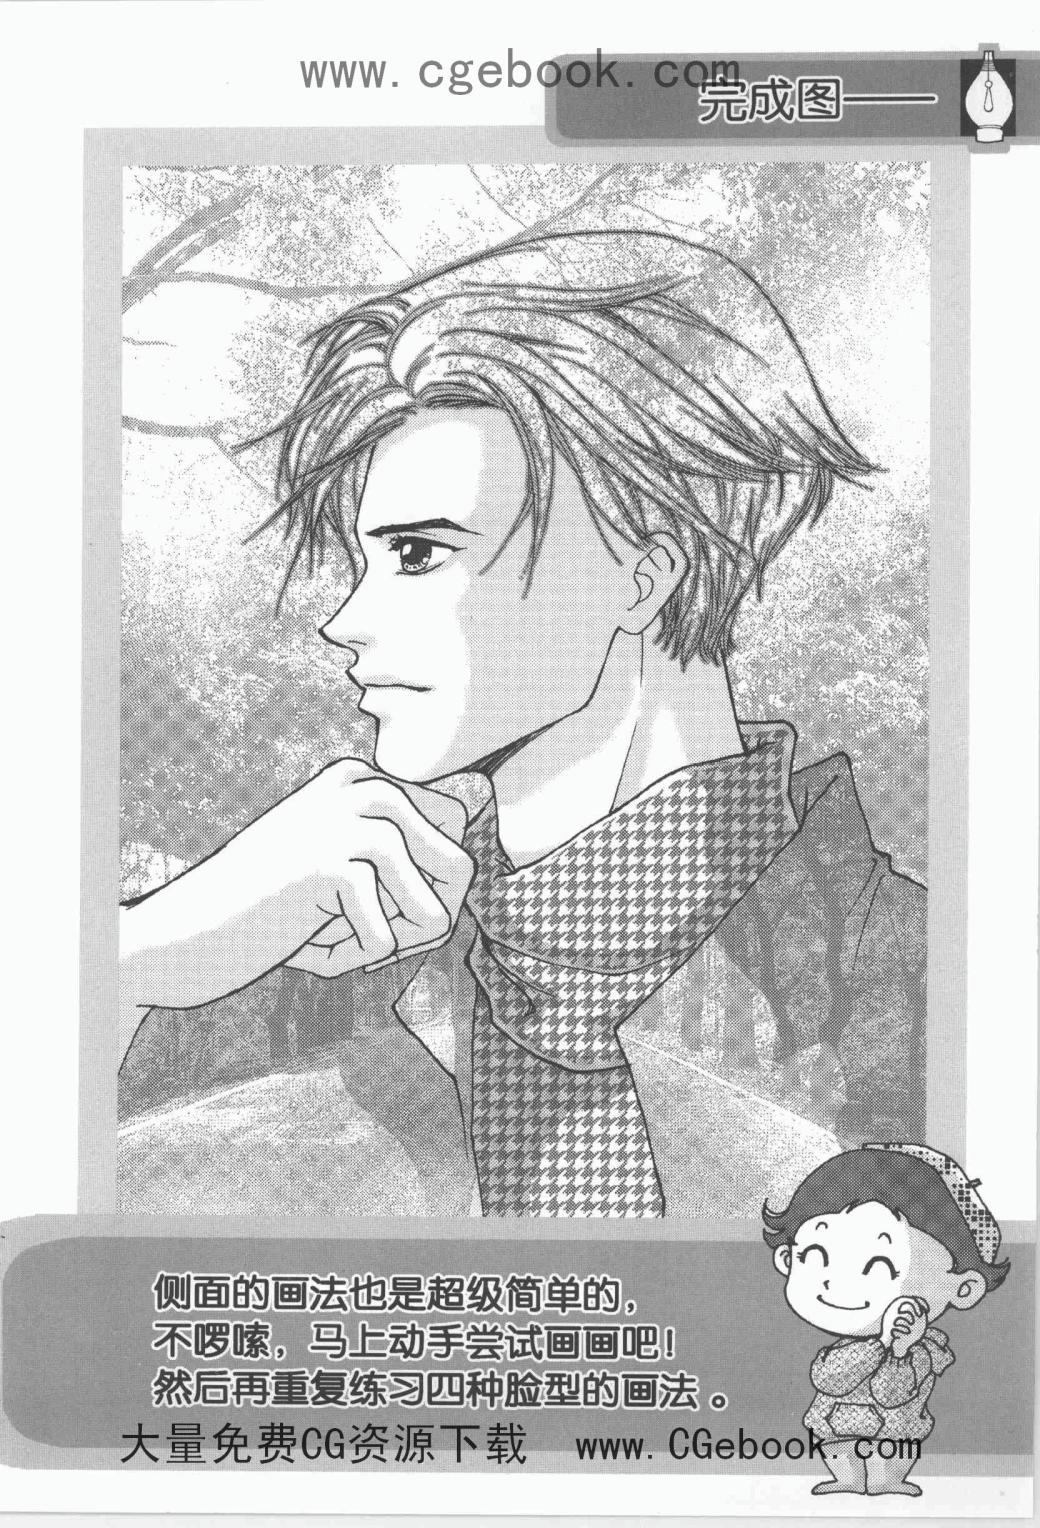 Cómo Dibujar Manga 6altnw0ri4475xnfg